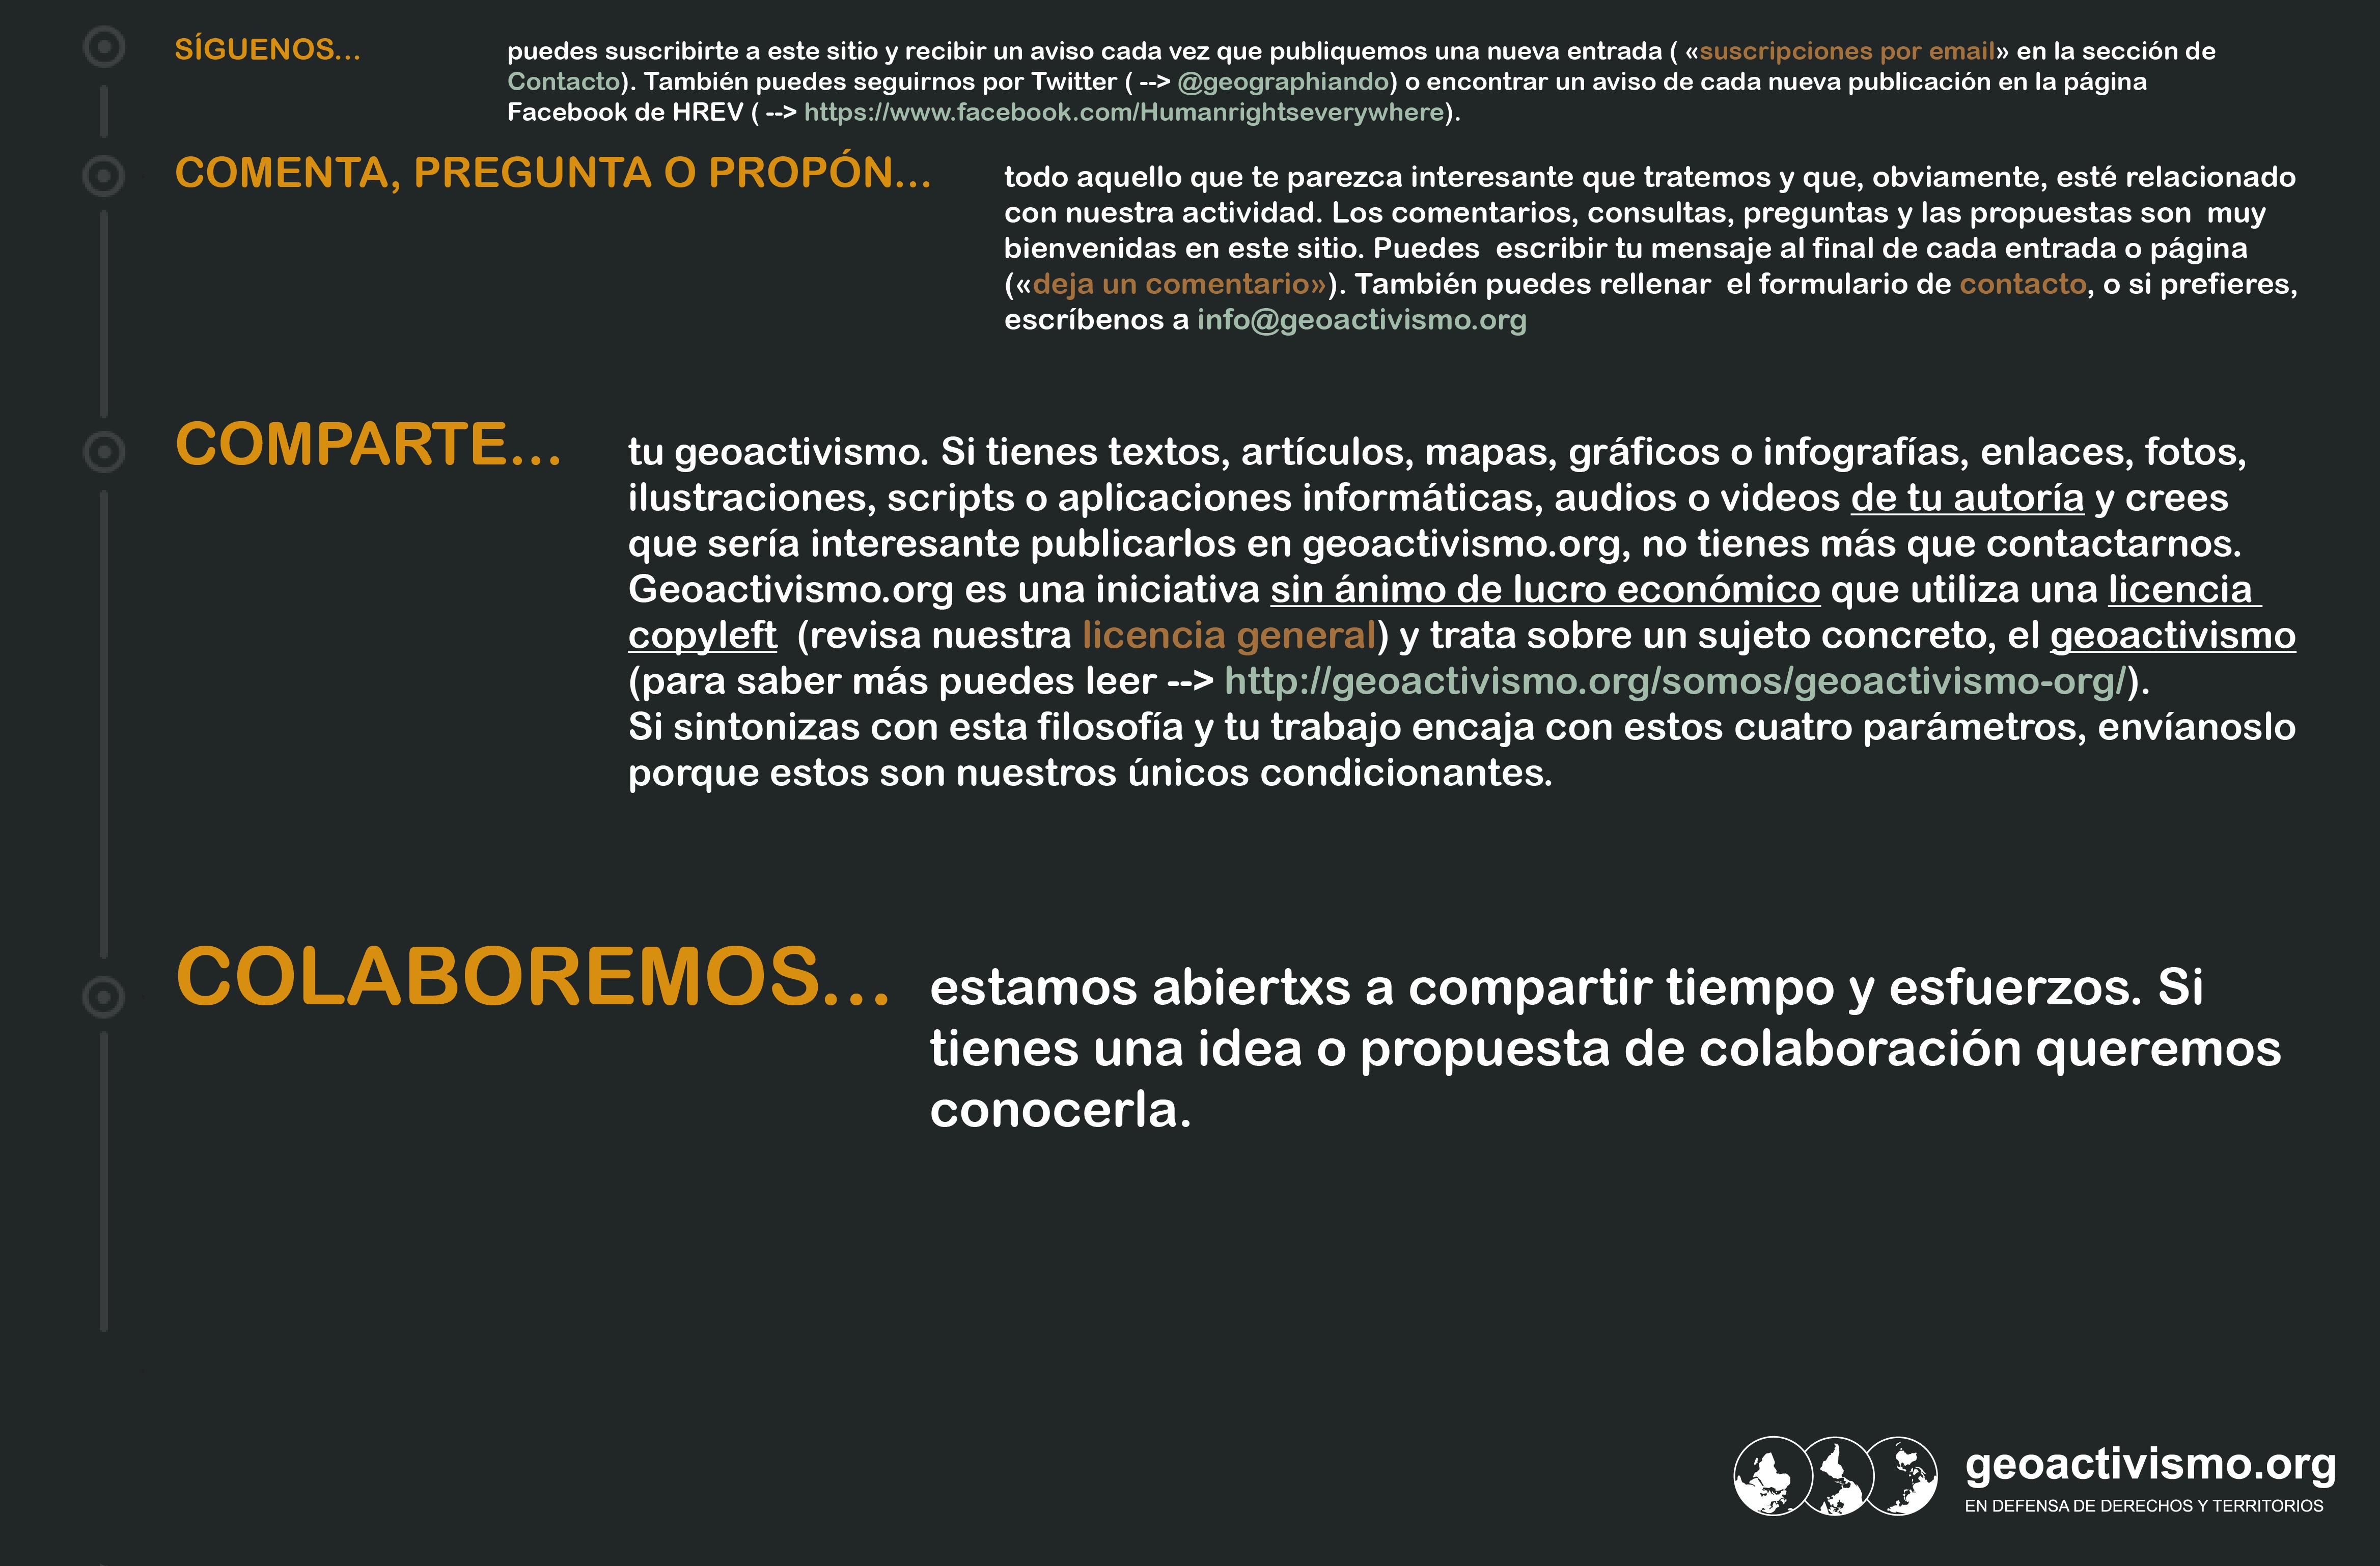 participa en geoactivismo.org